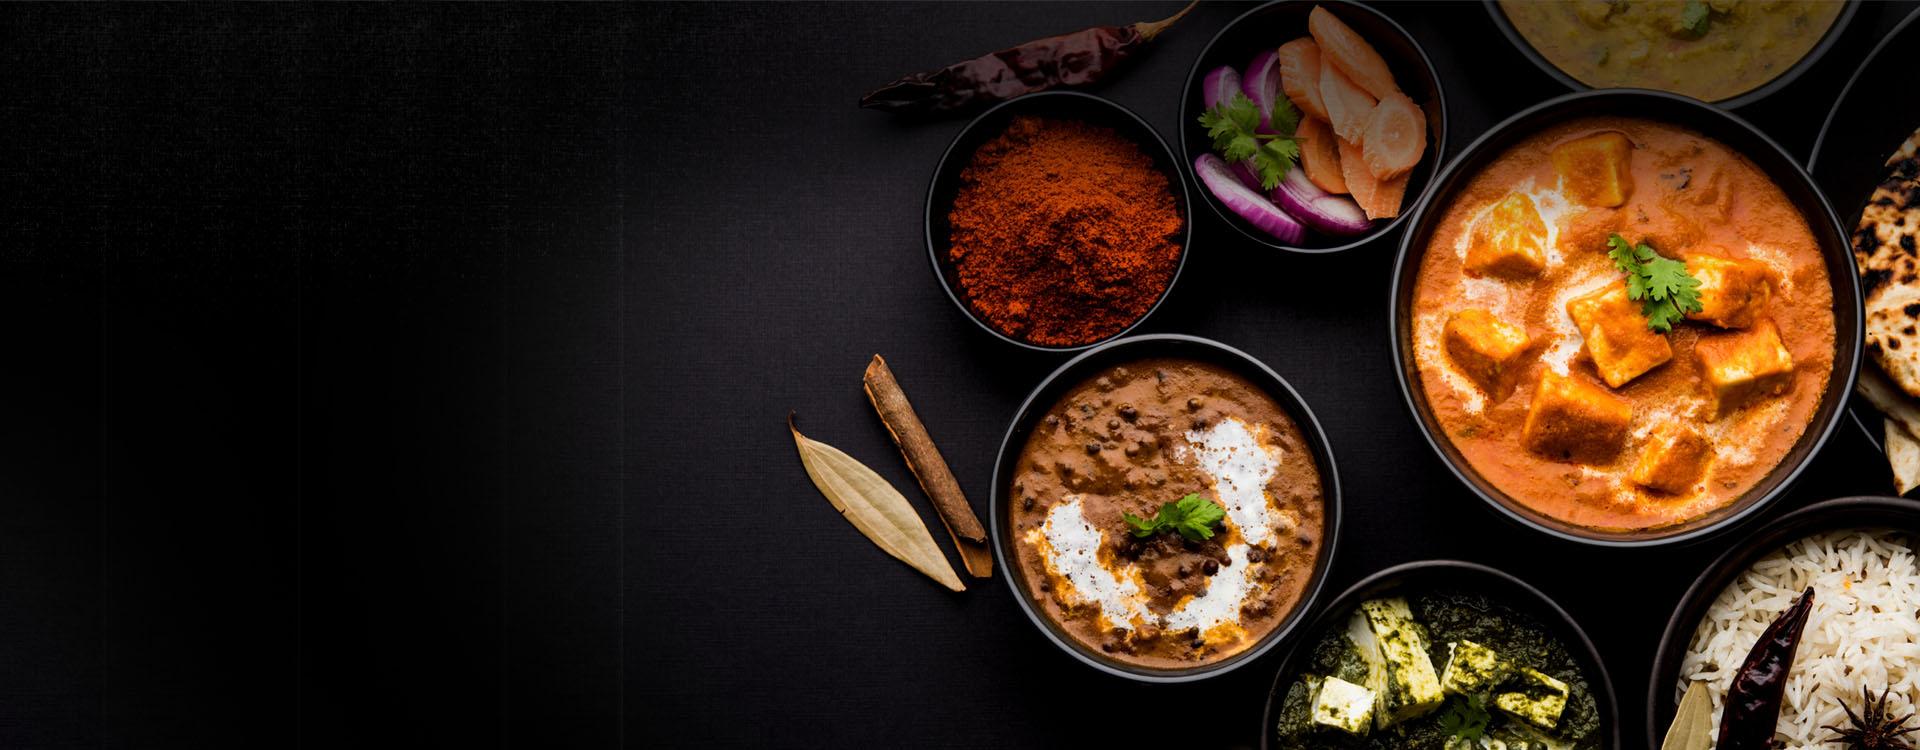 Indulge Your Taste Buds at Zaras Indian Restaurant - Open 7 Days a Week